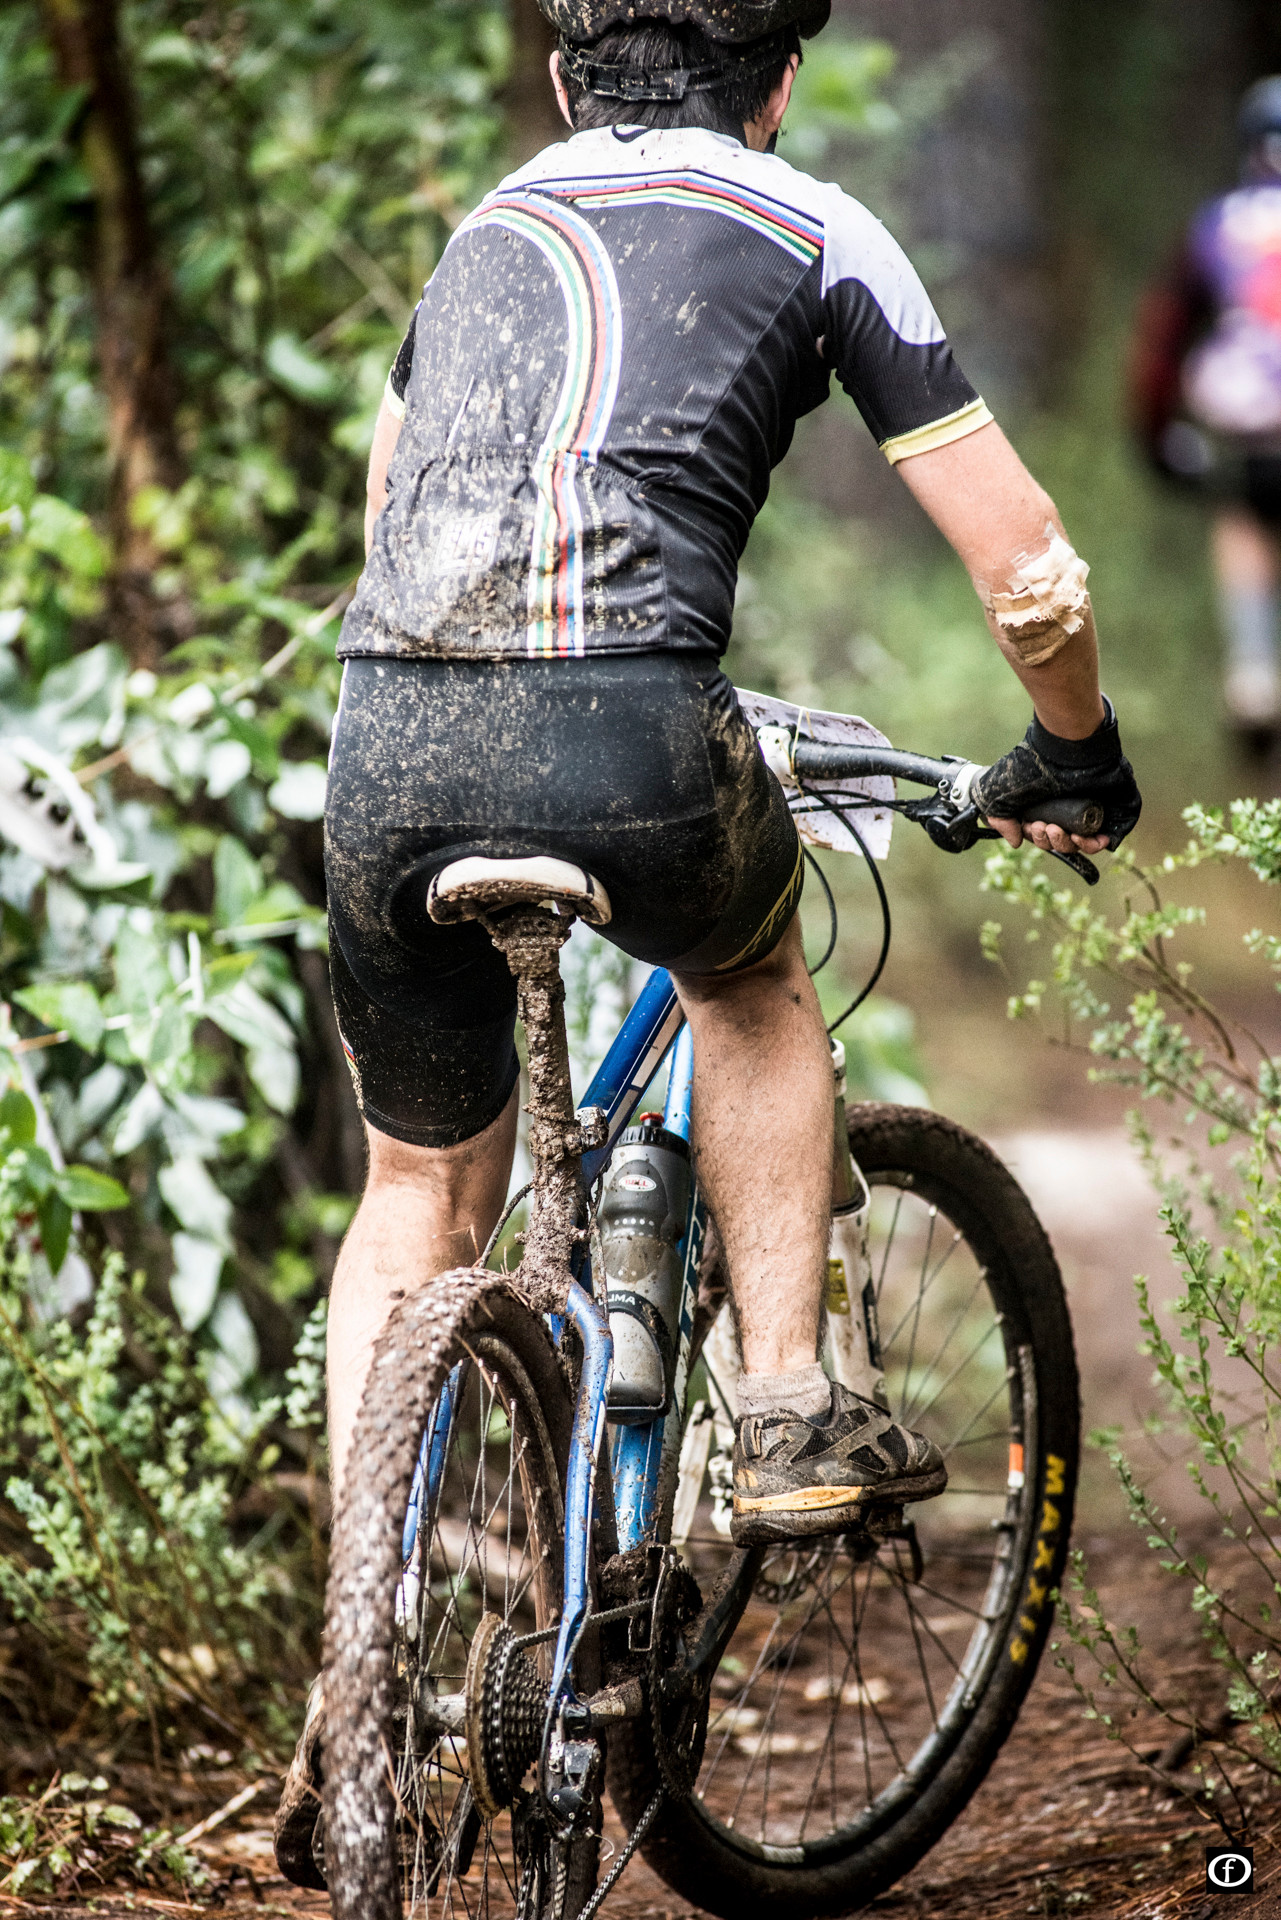 2015-05-17-Ciclismo Enduro-54.jpg